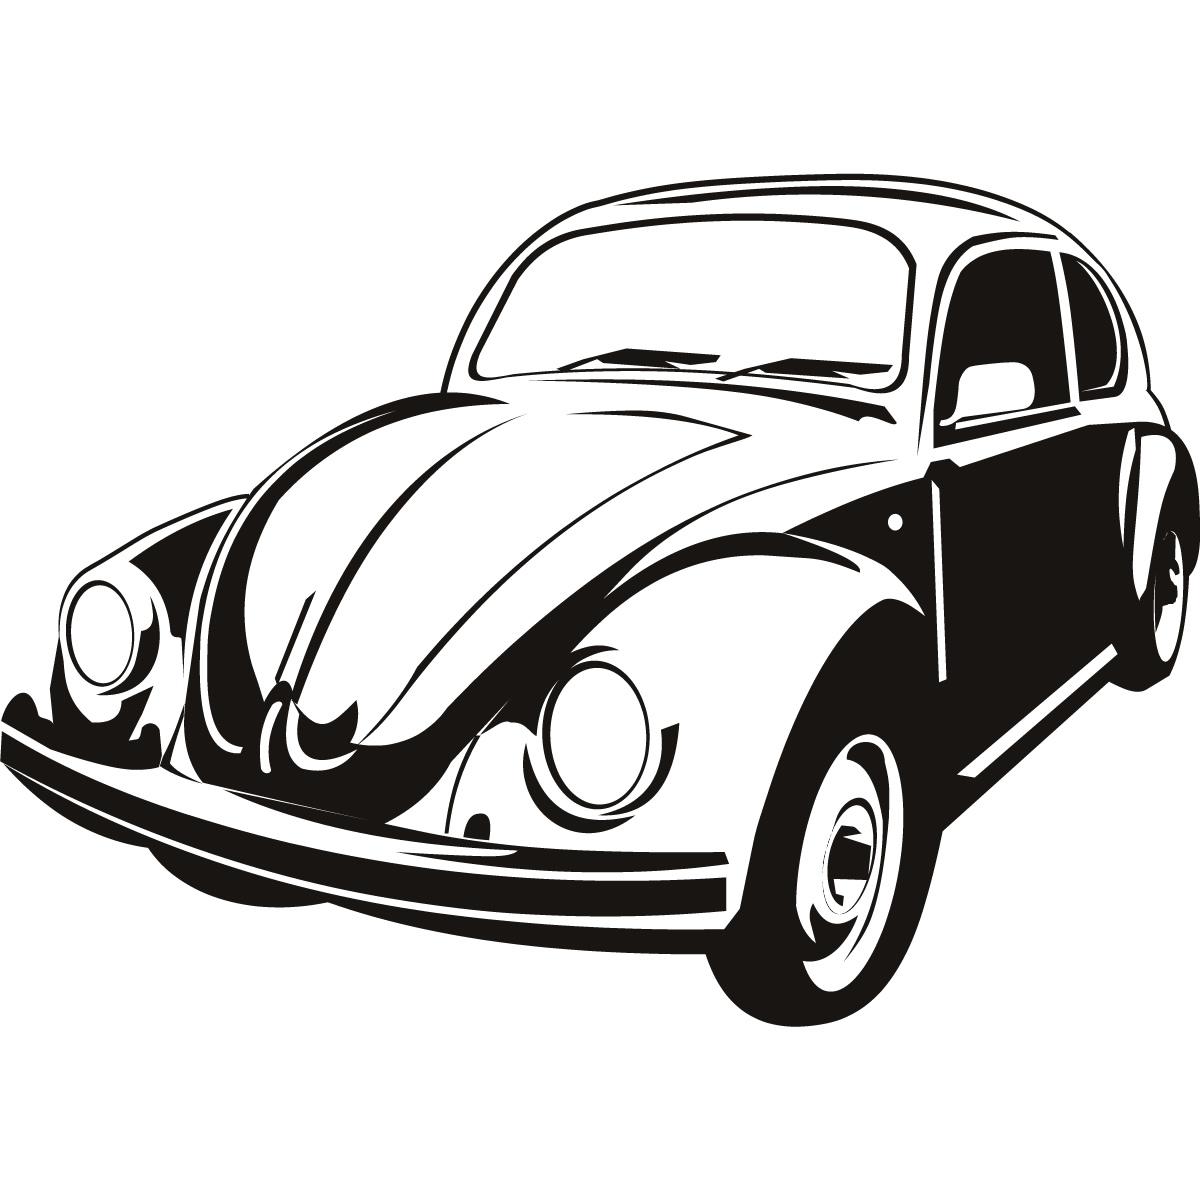 Free Volkswagen Beetle Cliparts, Download Free Clip Art.